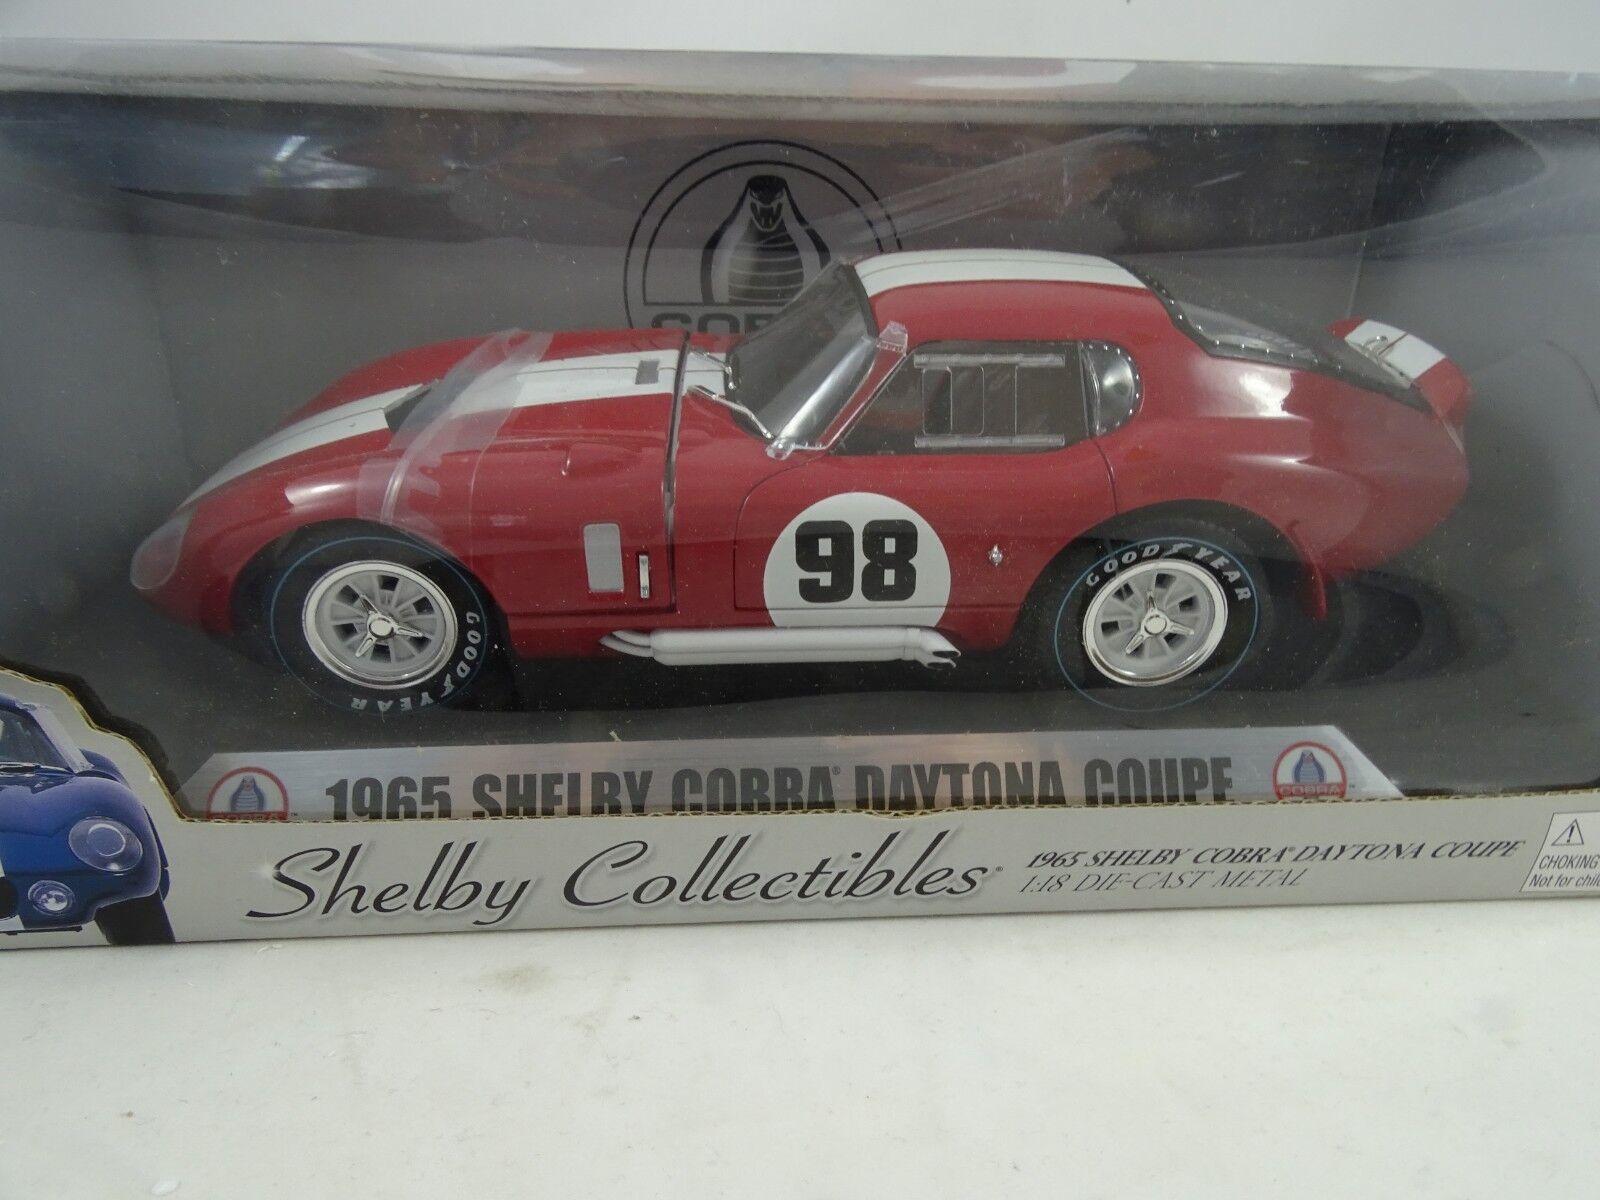 1 18 Shelby Collectibles  DC28902 - 1965 Shelby Cobra Daytona Coupe  98 Red RAR §